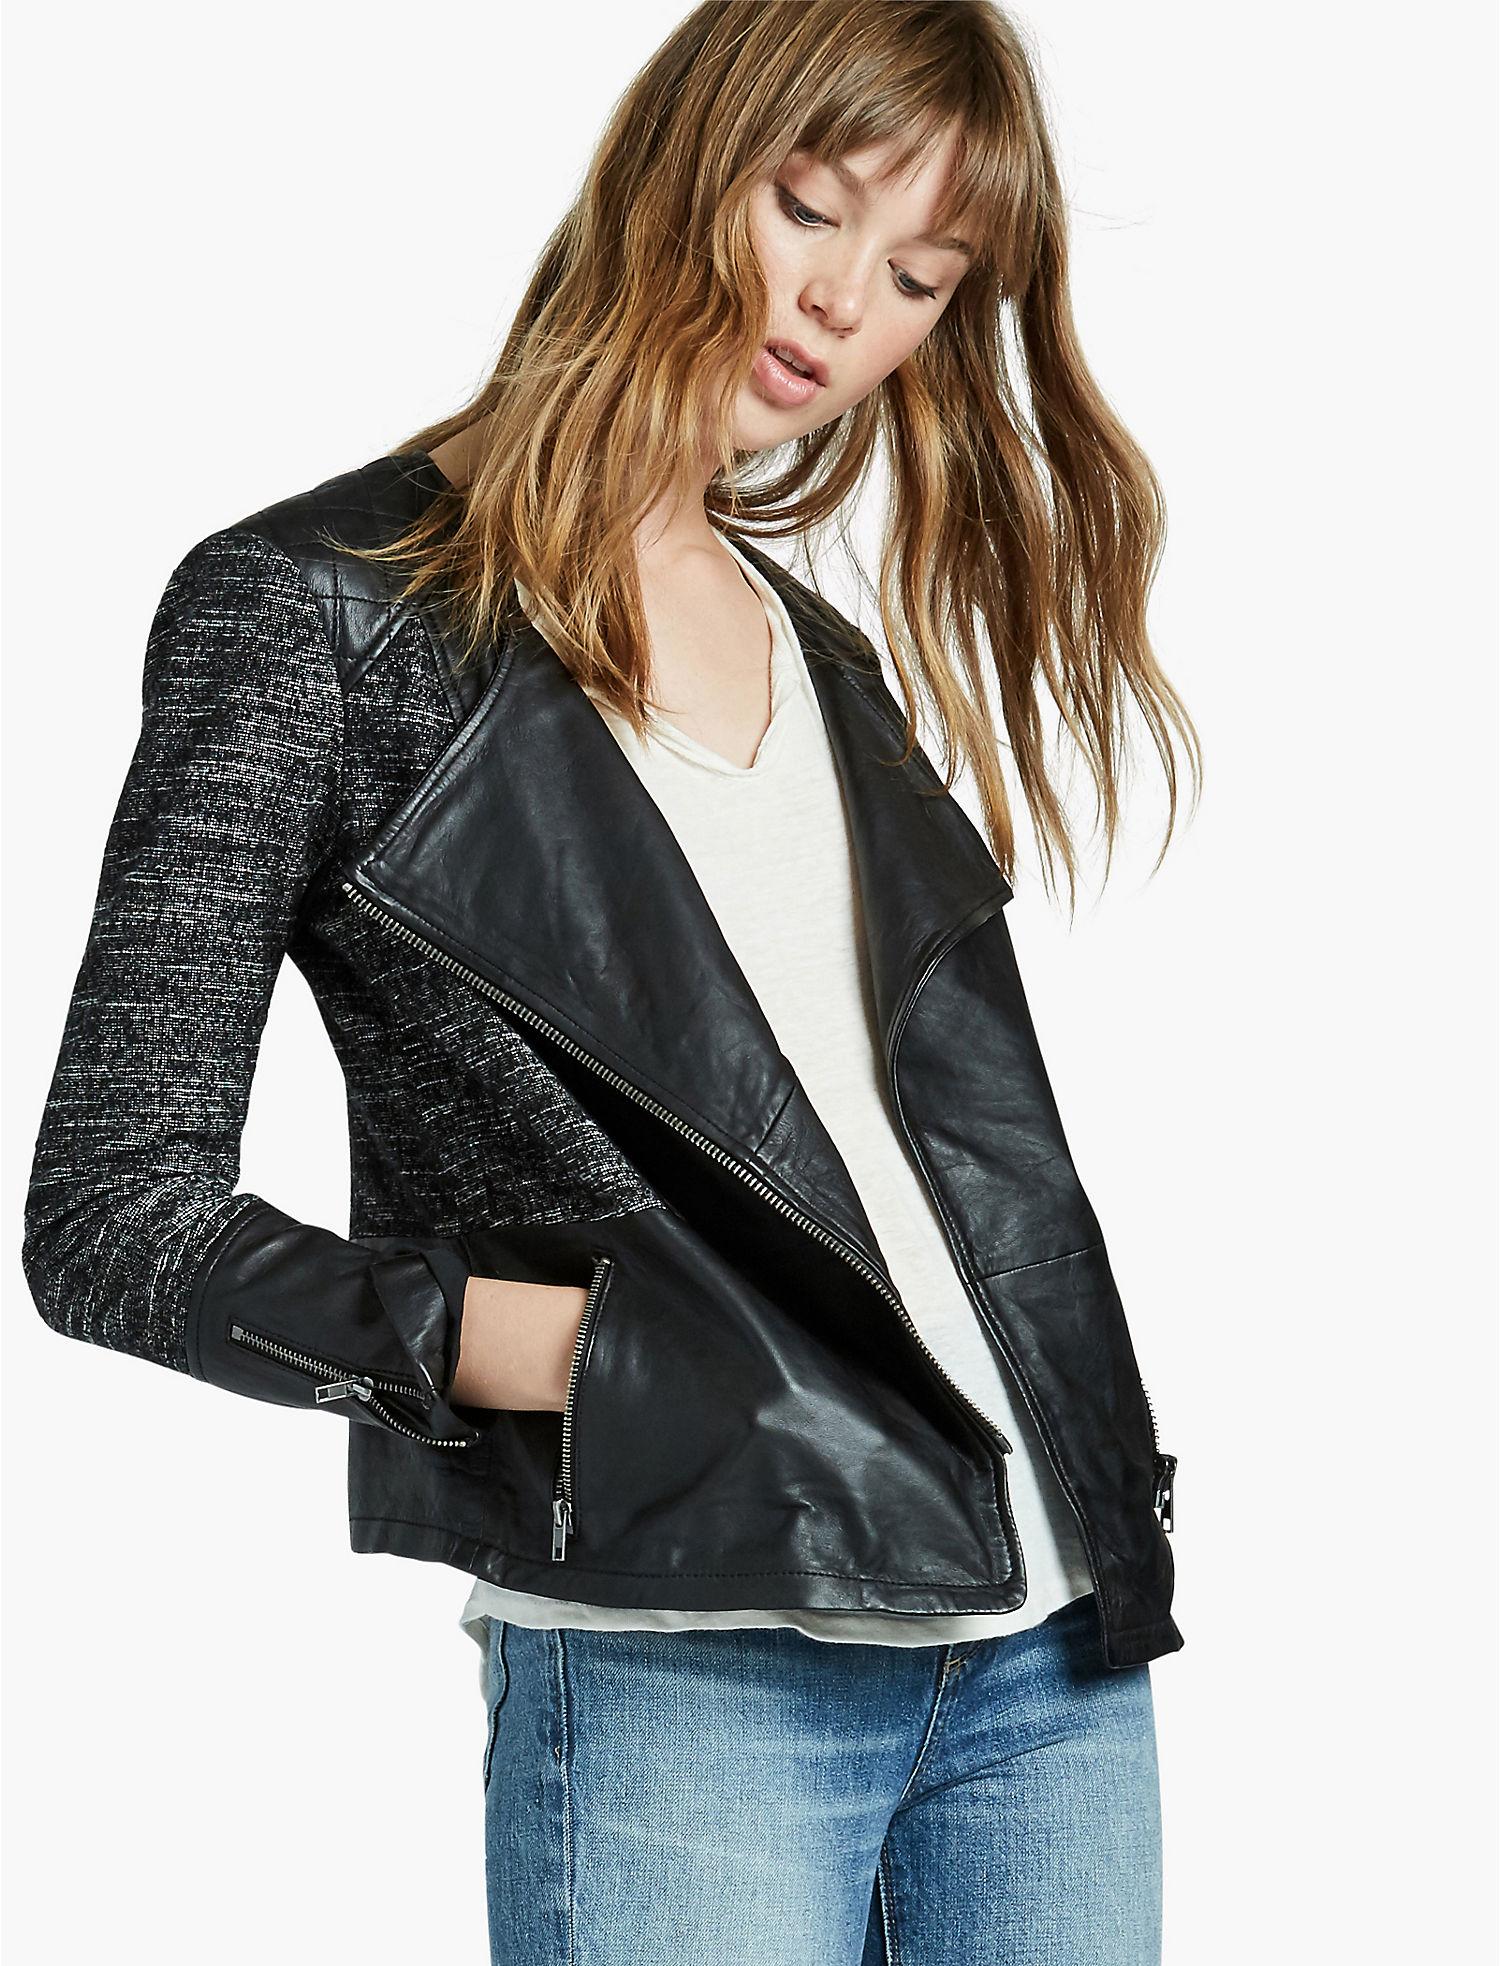 Leather jacket vs motorcycle jacket - Lucky Mixed Media Leather Moto